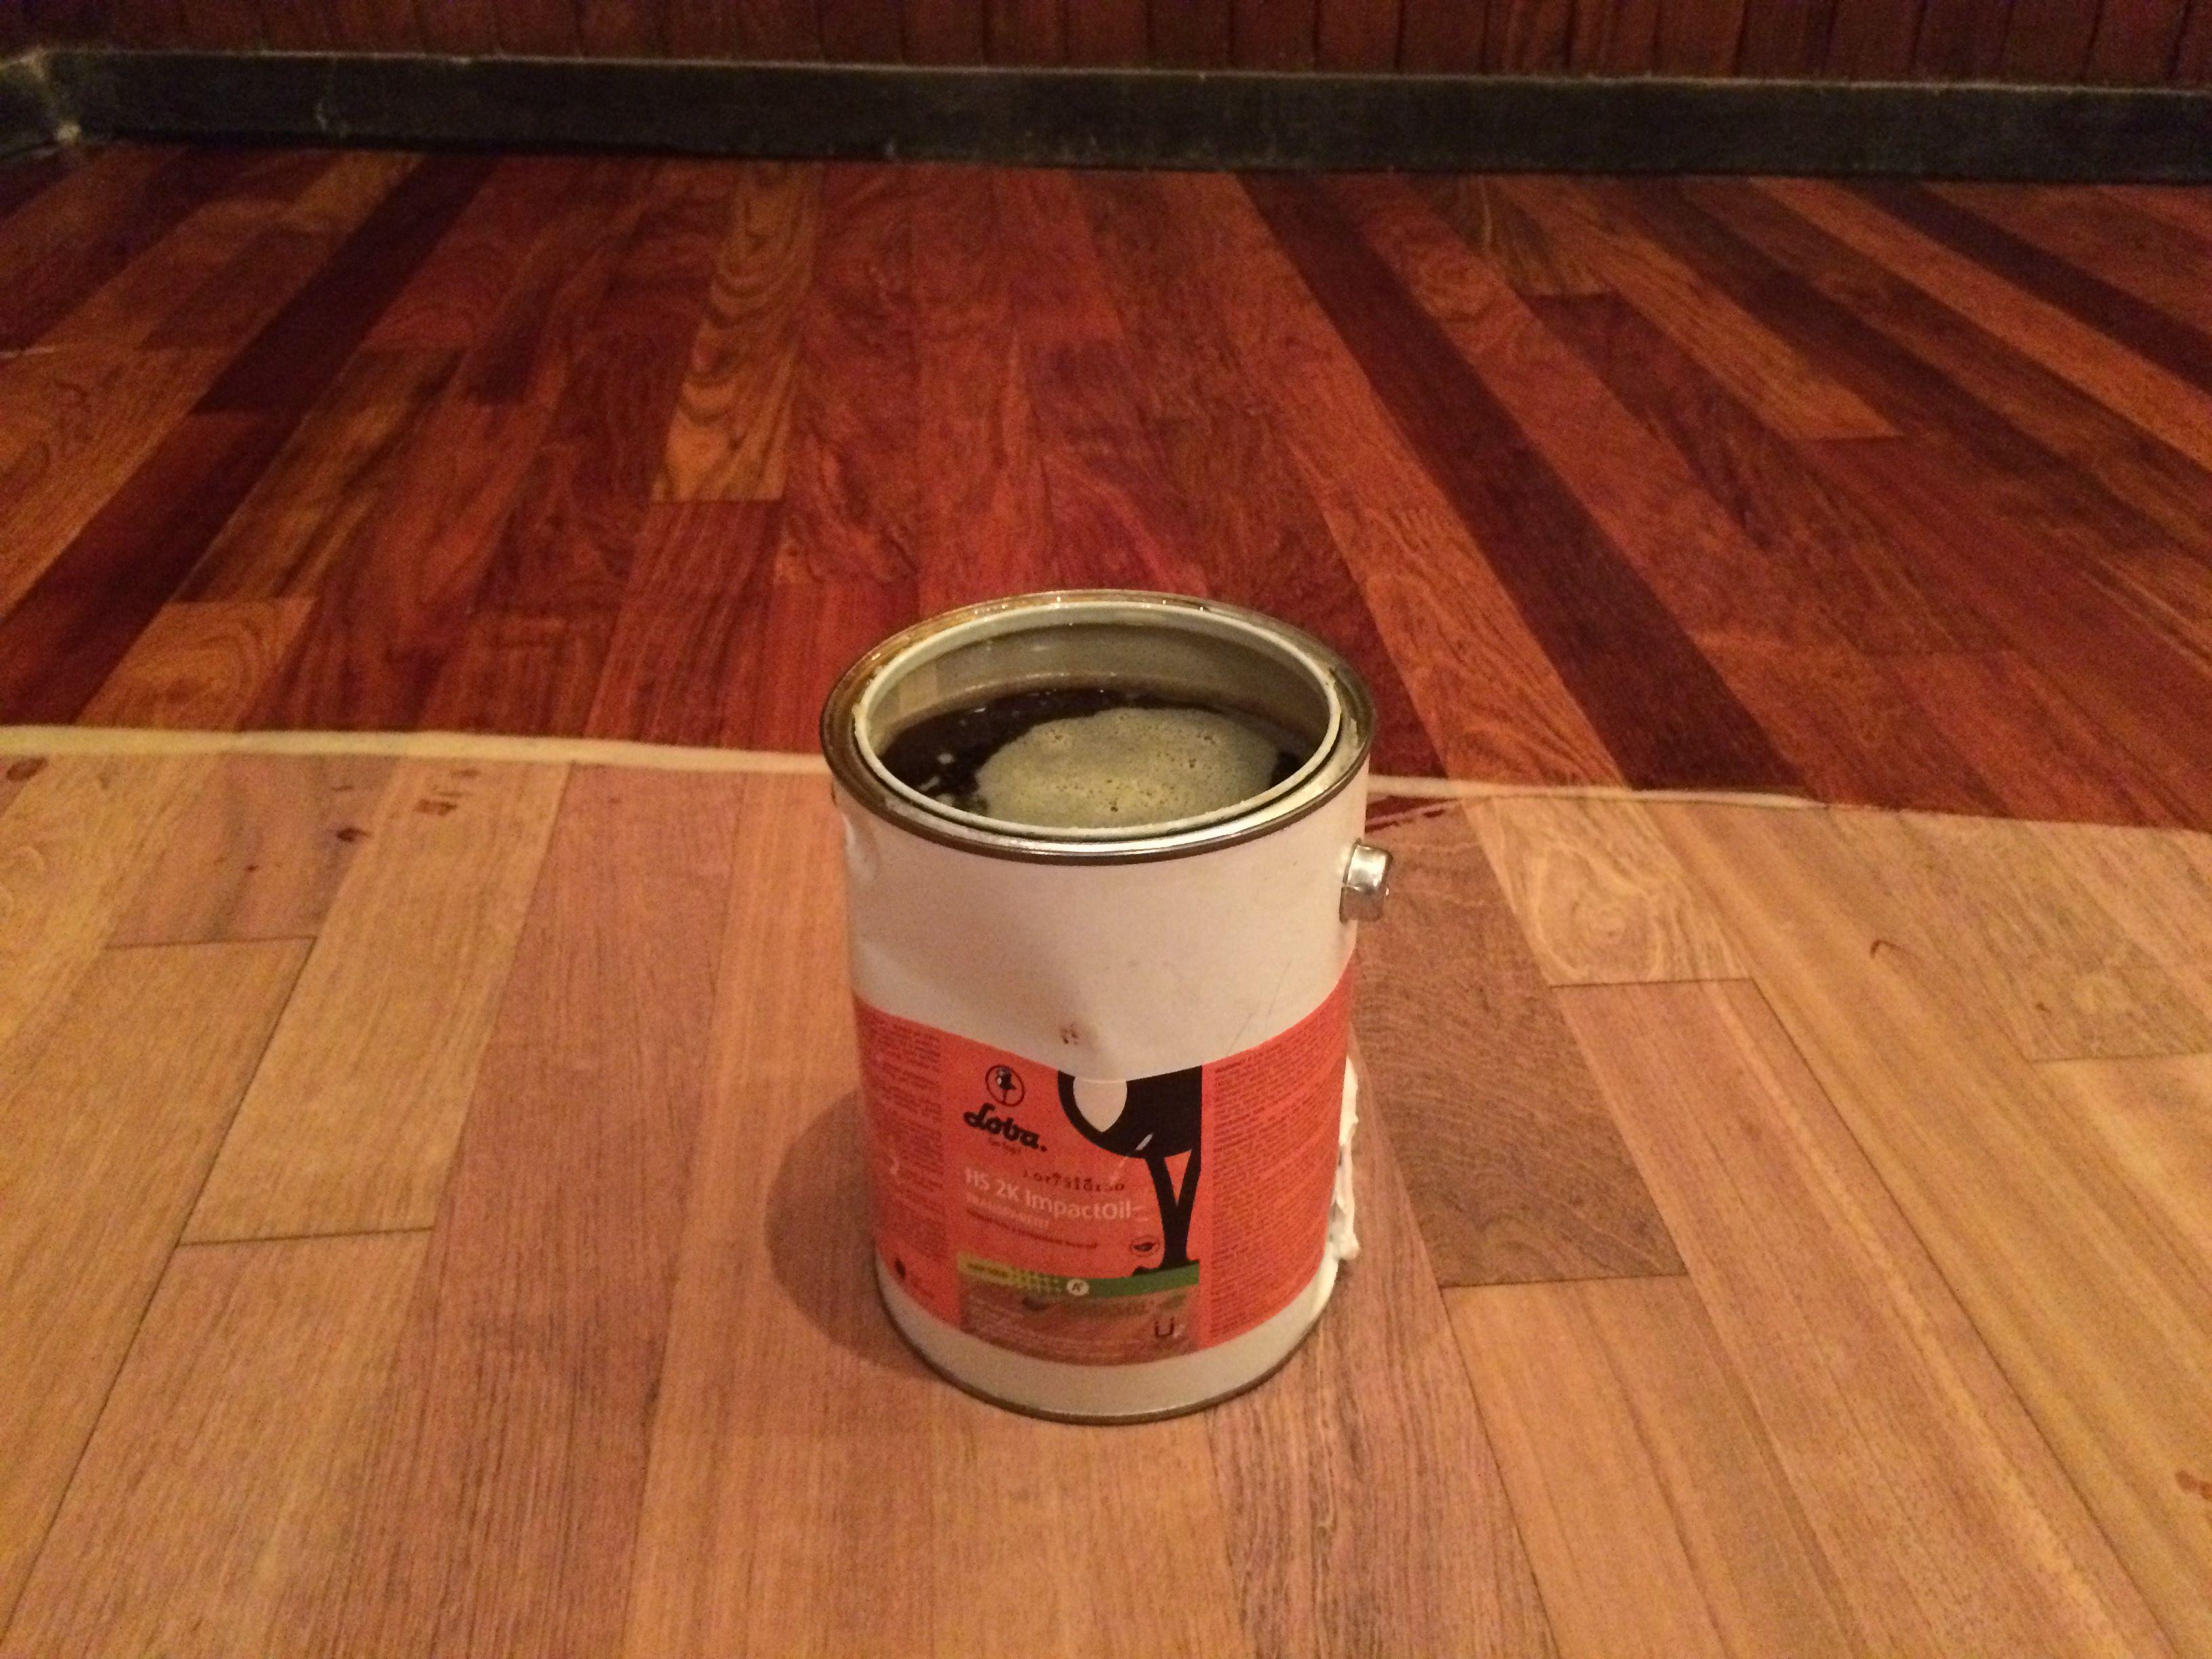 Loba 2K Impact Oil - 1 coat hardwood floor finishing system | Floors ...